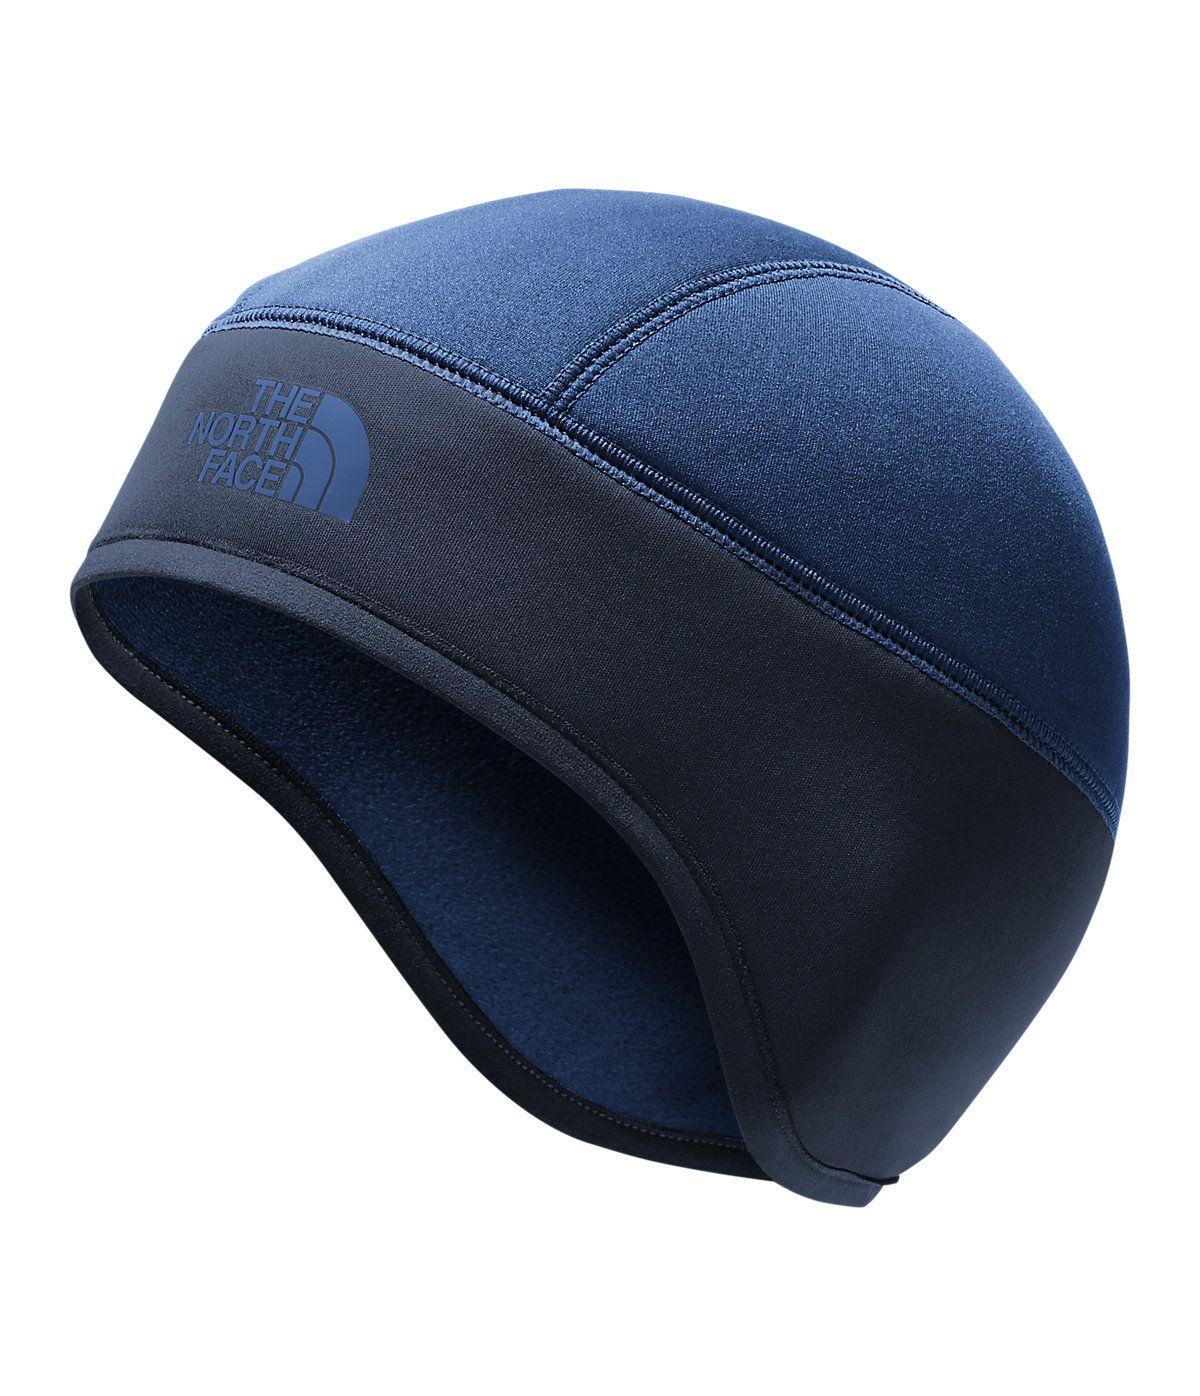 c71fd9d1a WindWall® Beanie in 2019   Products   Beanie hats, Beanie, The north ...